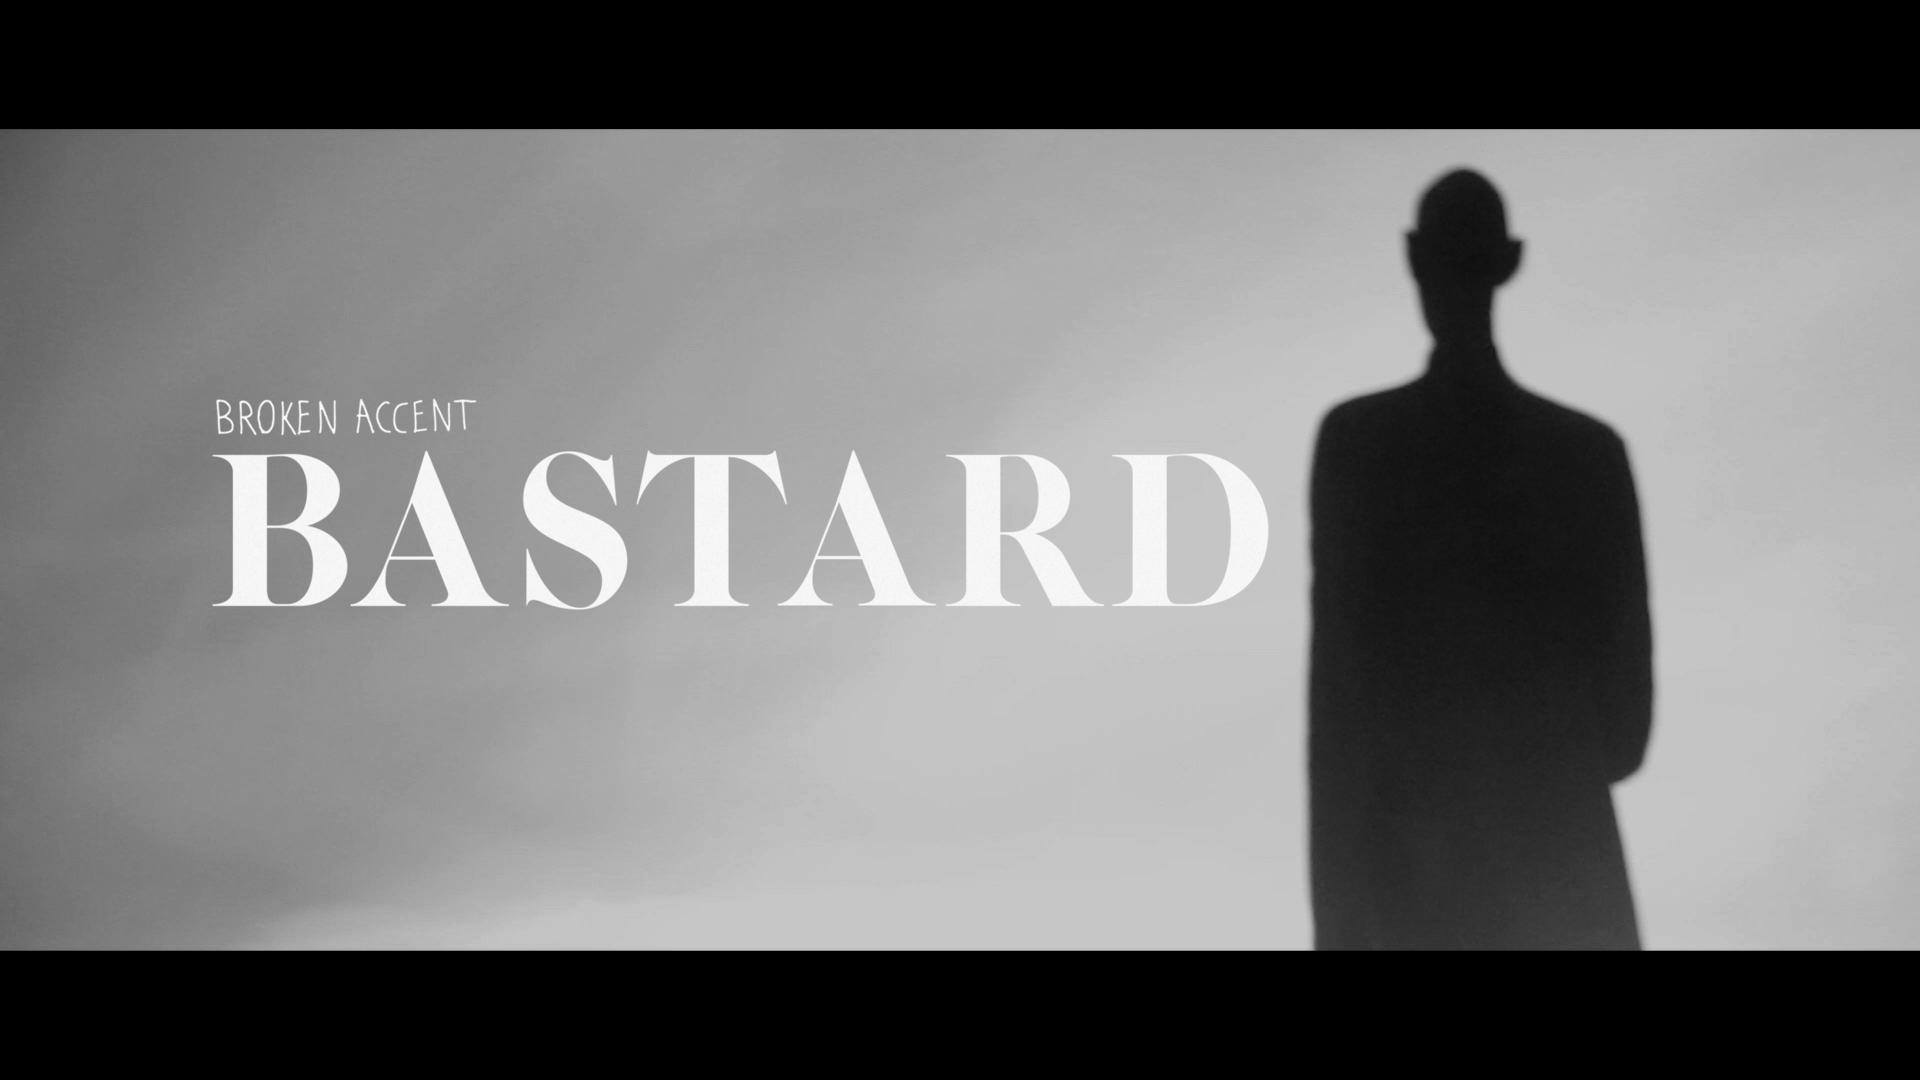 Bastard2.jpg